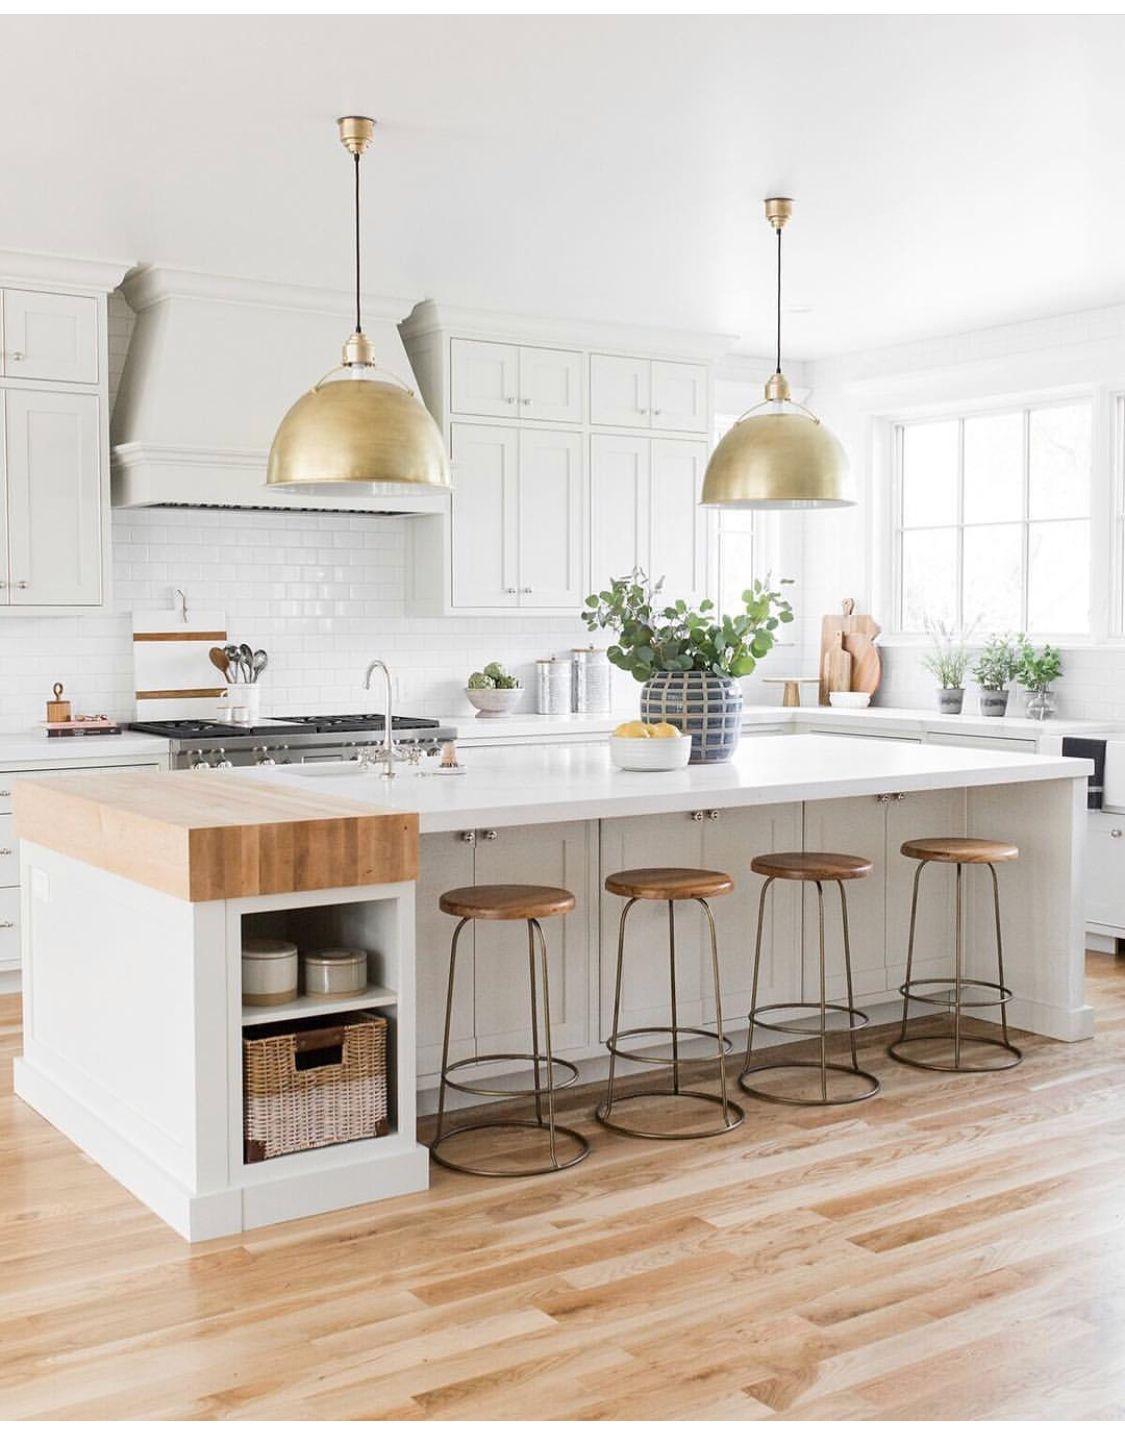 kitchen design ideas white kitchens kitchen inspiration dining table accessories table on kitchen interior accessories id=39348